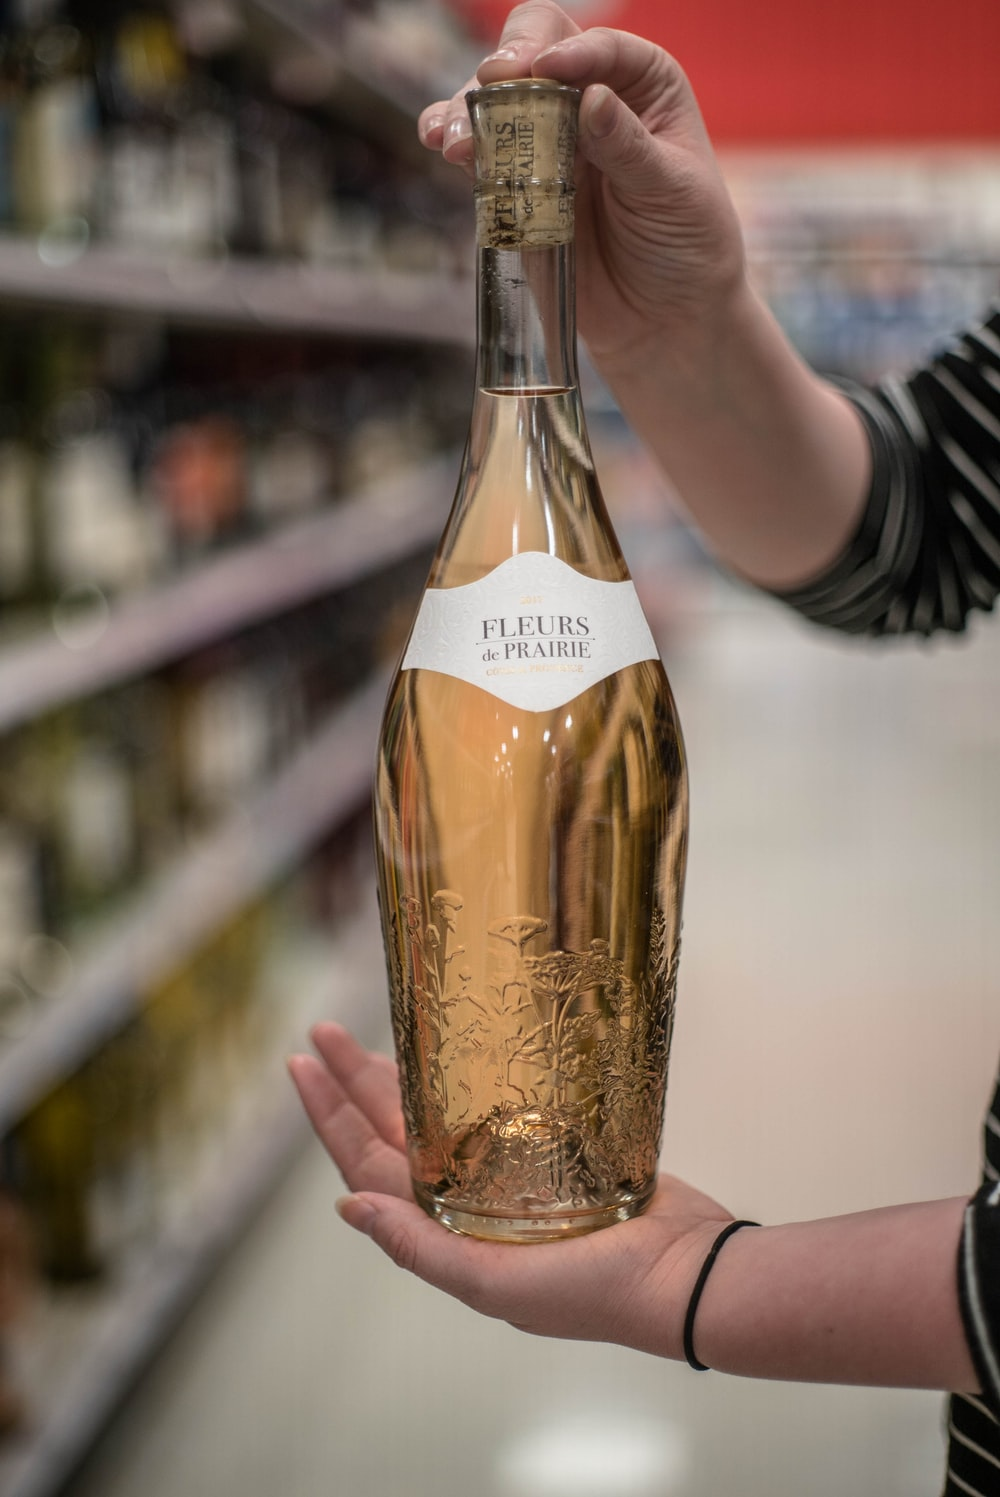 person holding Fleurs bottle inside store